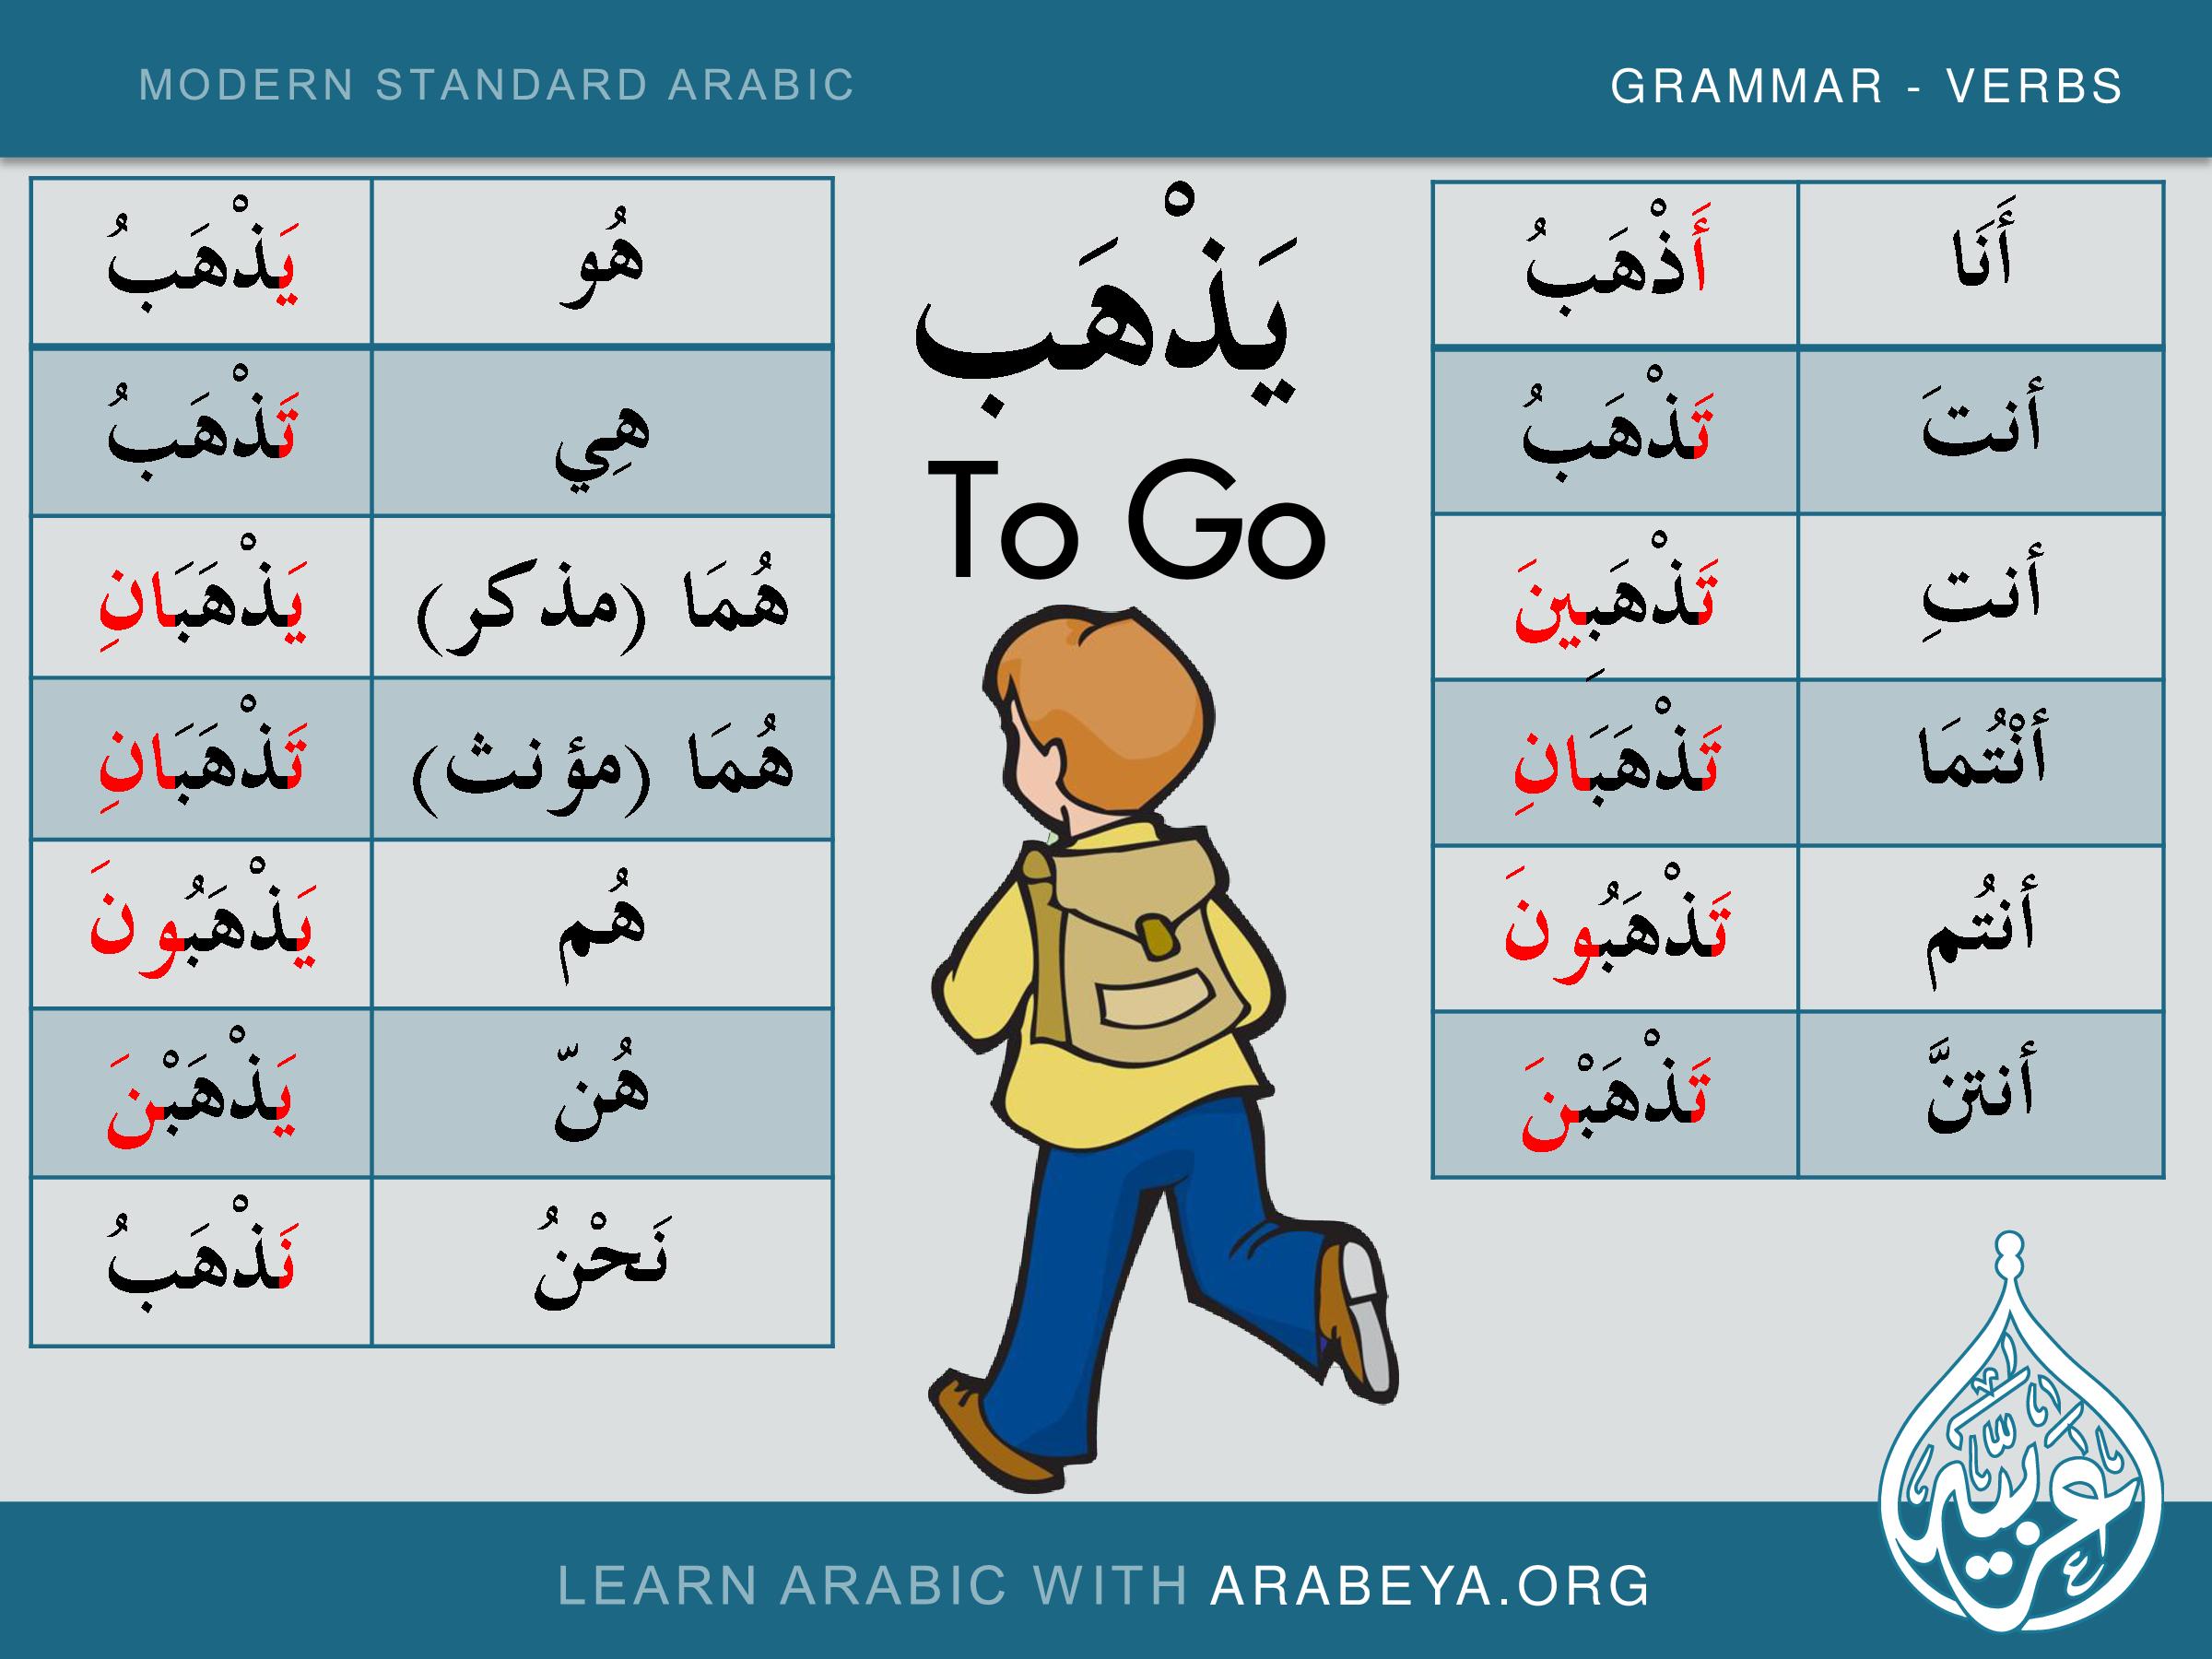 Epingle Par Arabeya Arabic Language Center Sur Learn New